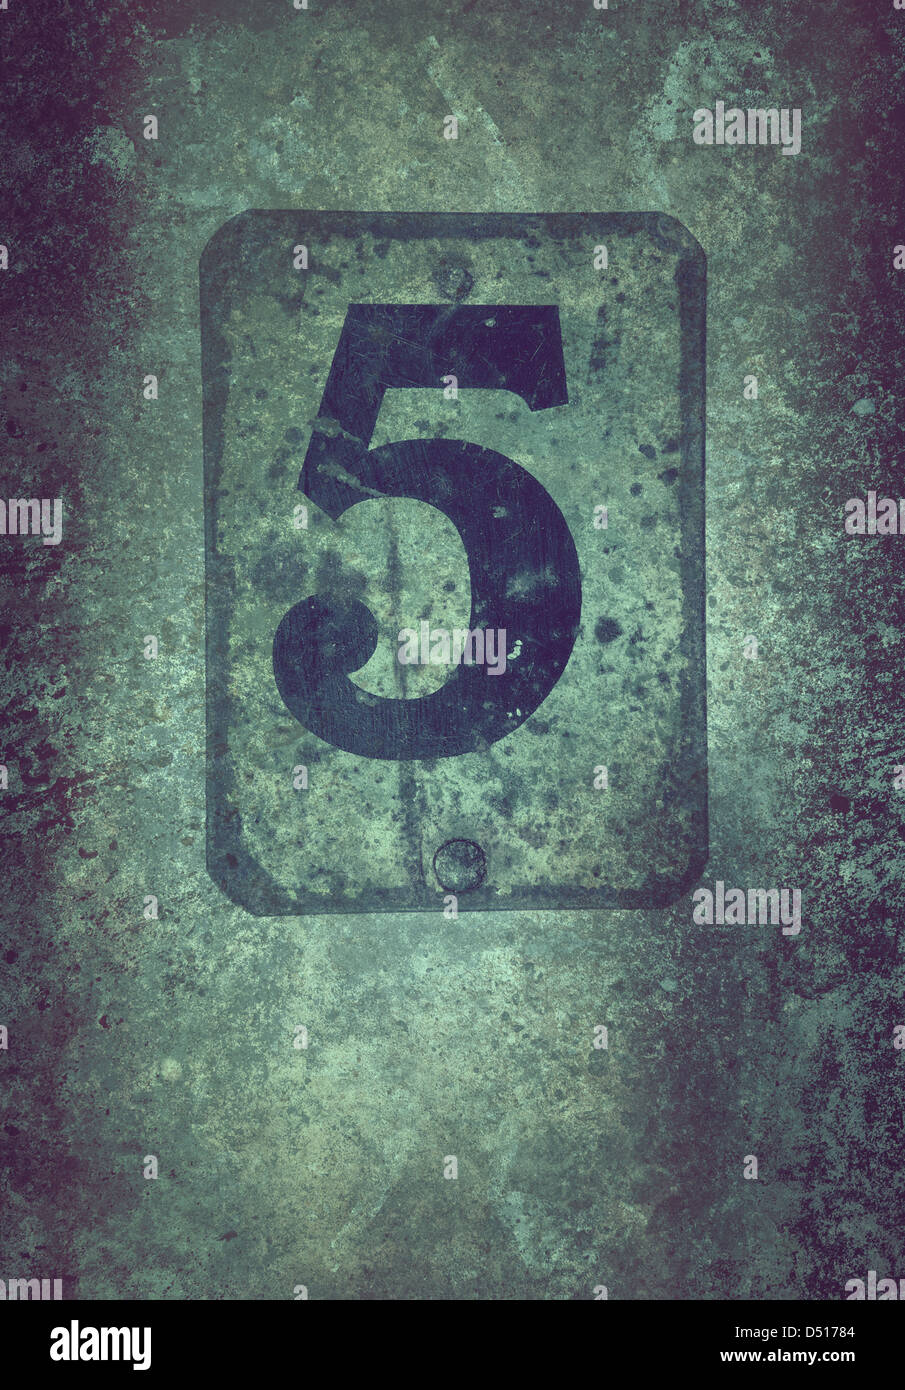 grunge 5 - Stock Image